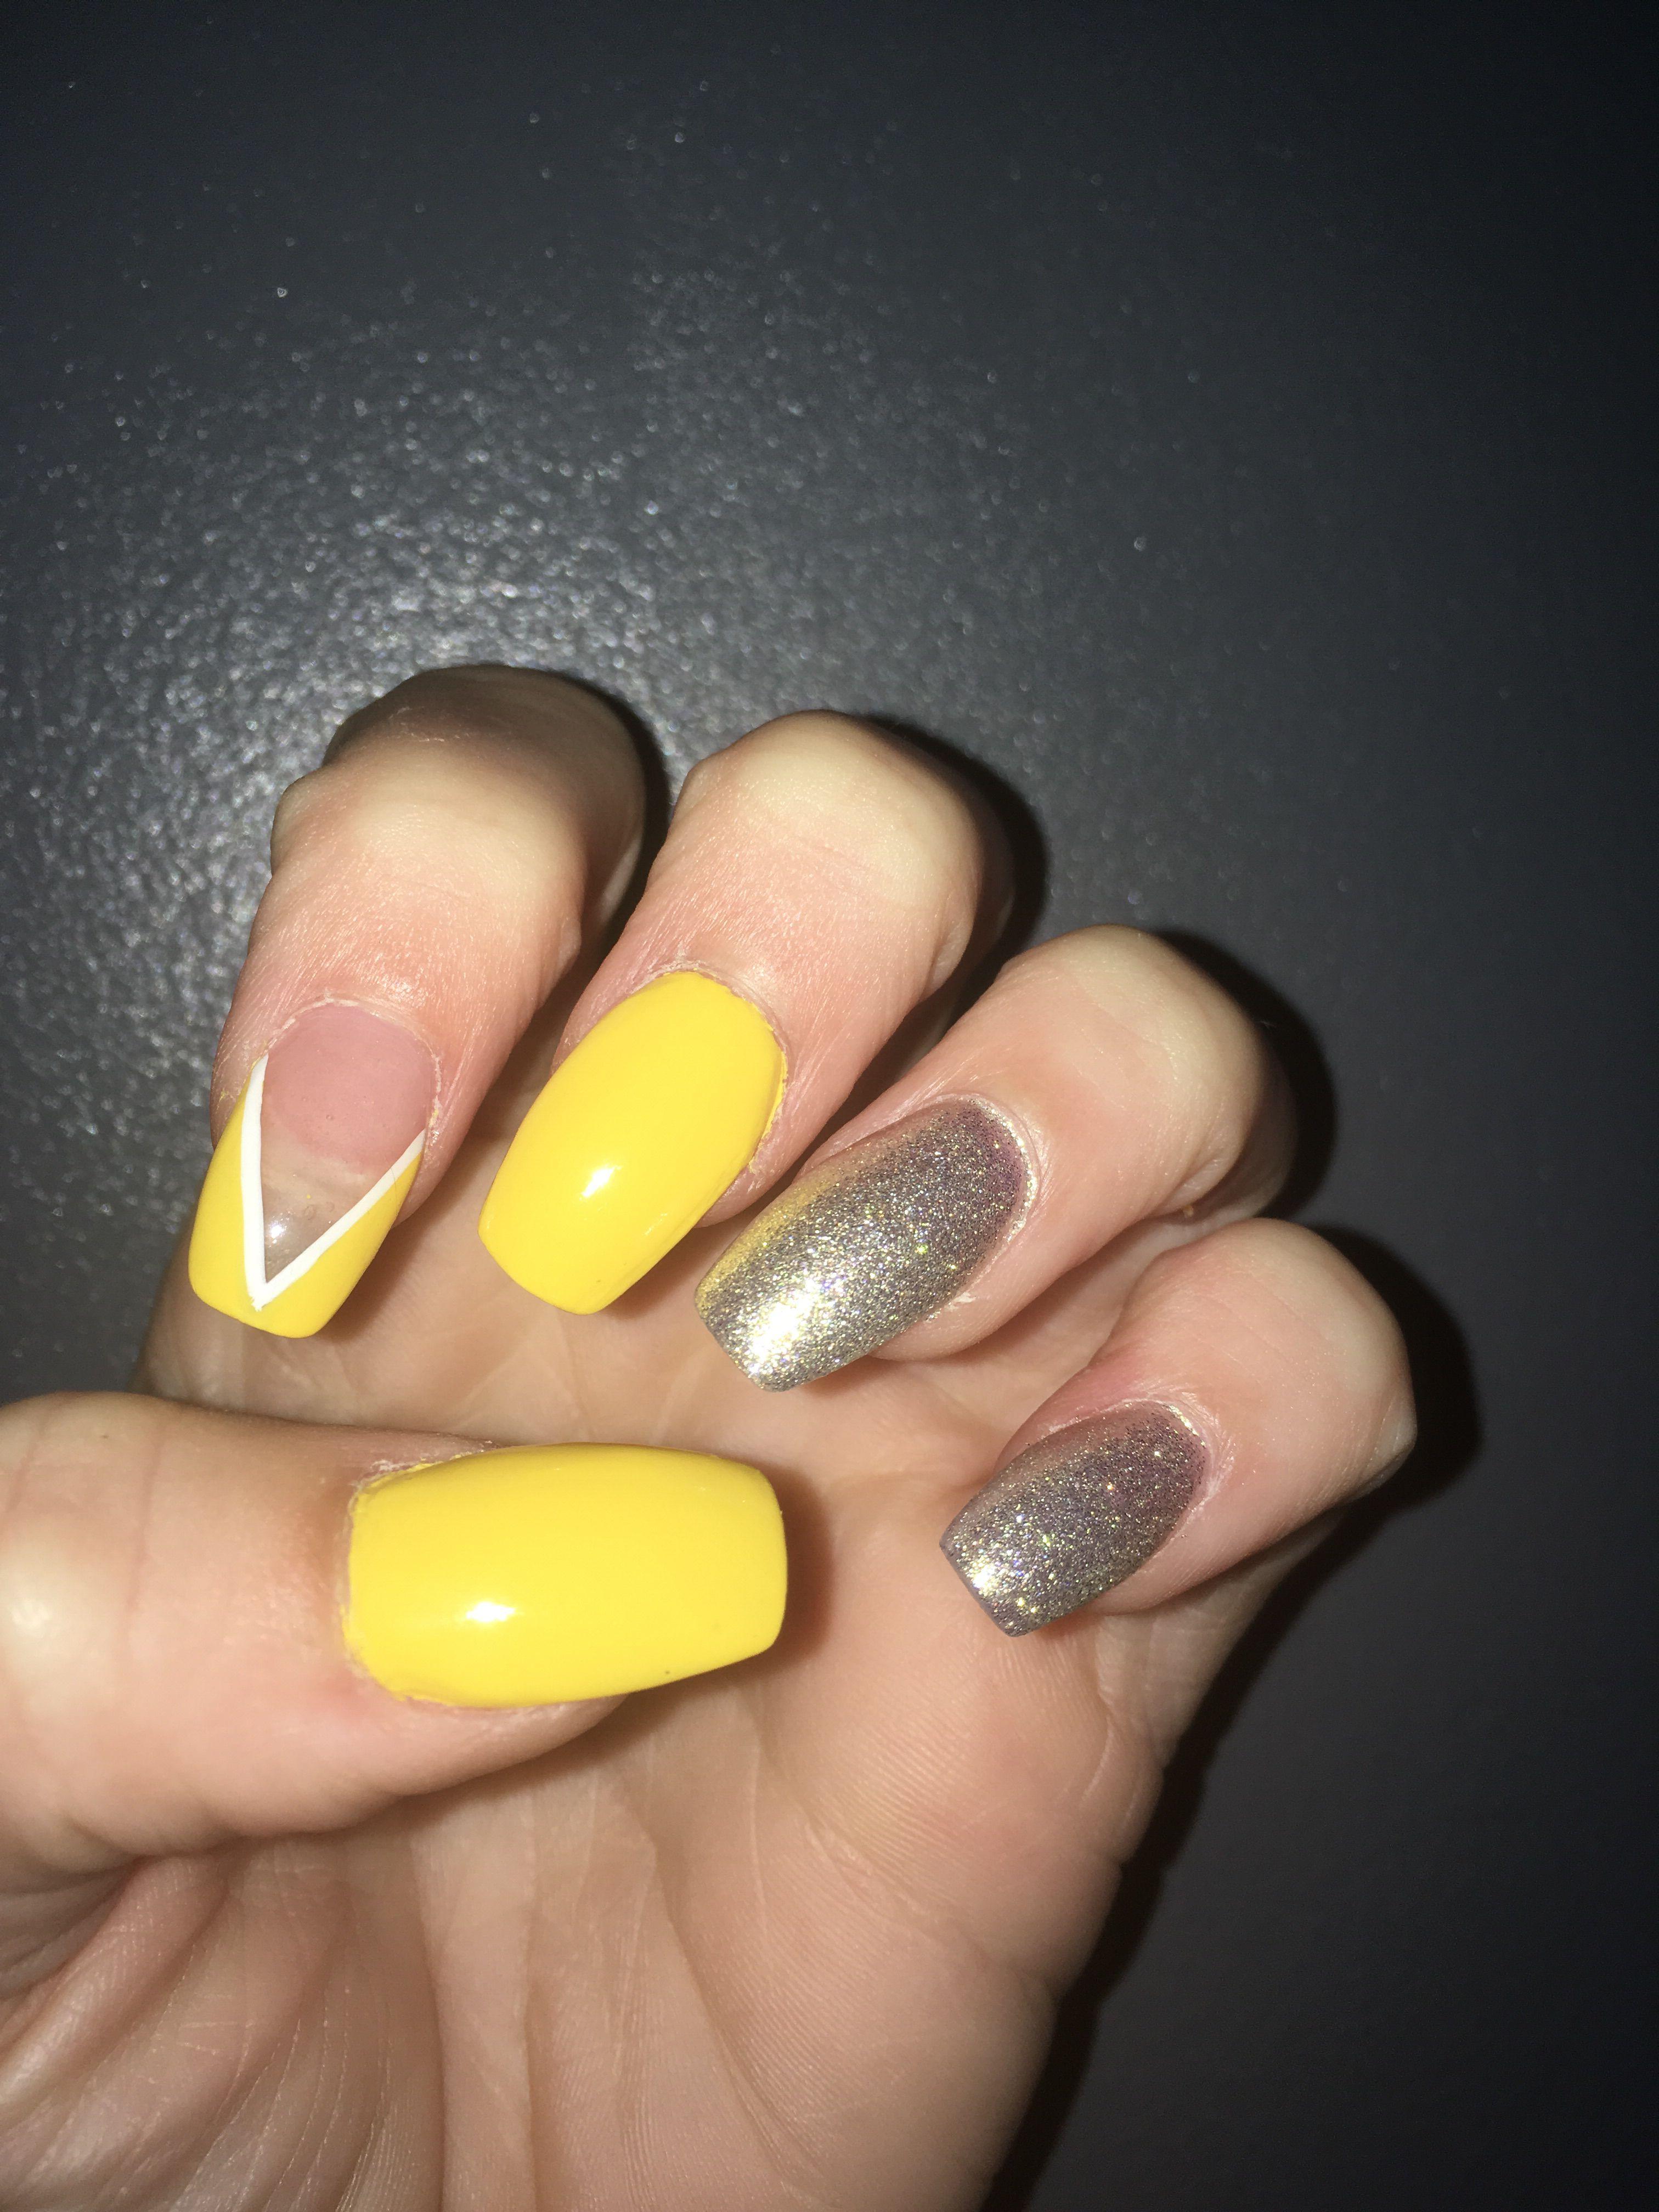 Acrylic Nails Neon Acrylic Nails Acrylic Nails Yellow Neon Yellow Nails